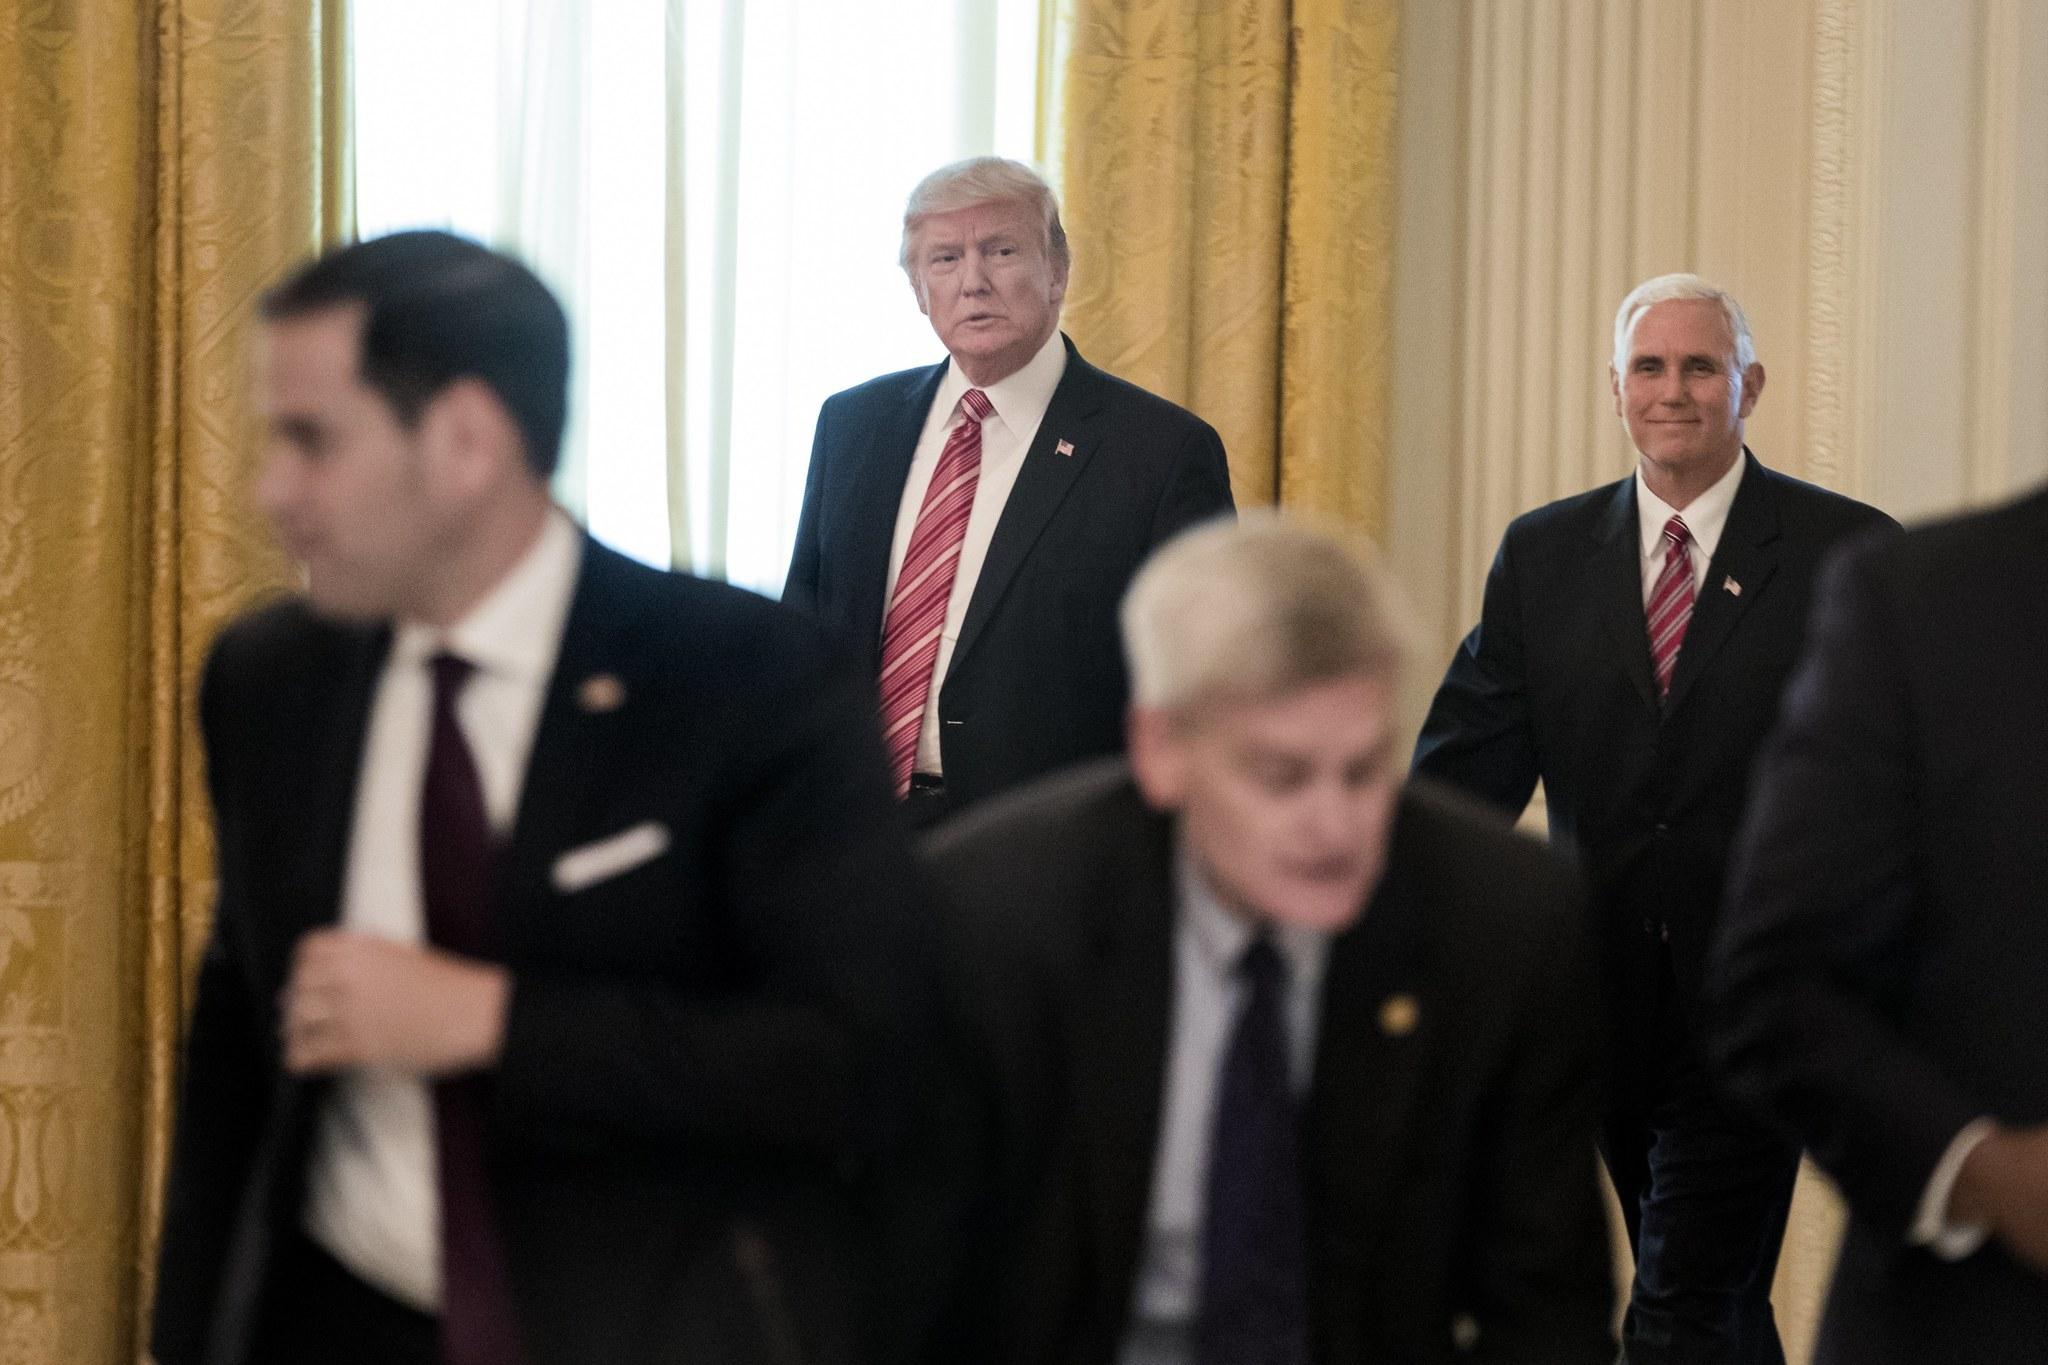 Will Donald Trump be the last Republican president?